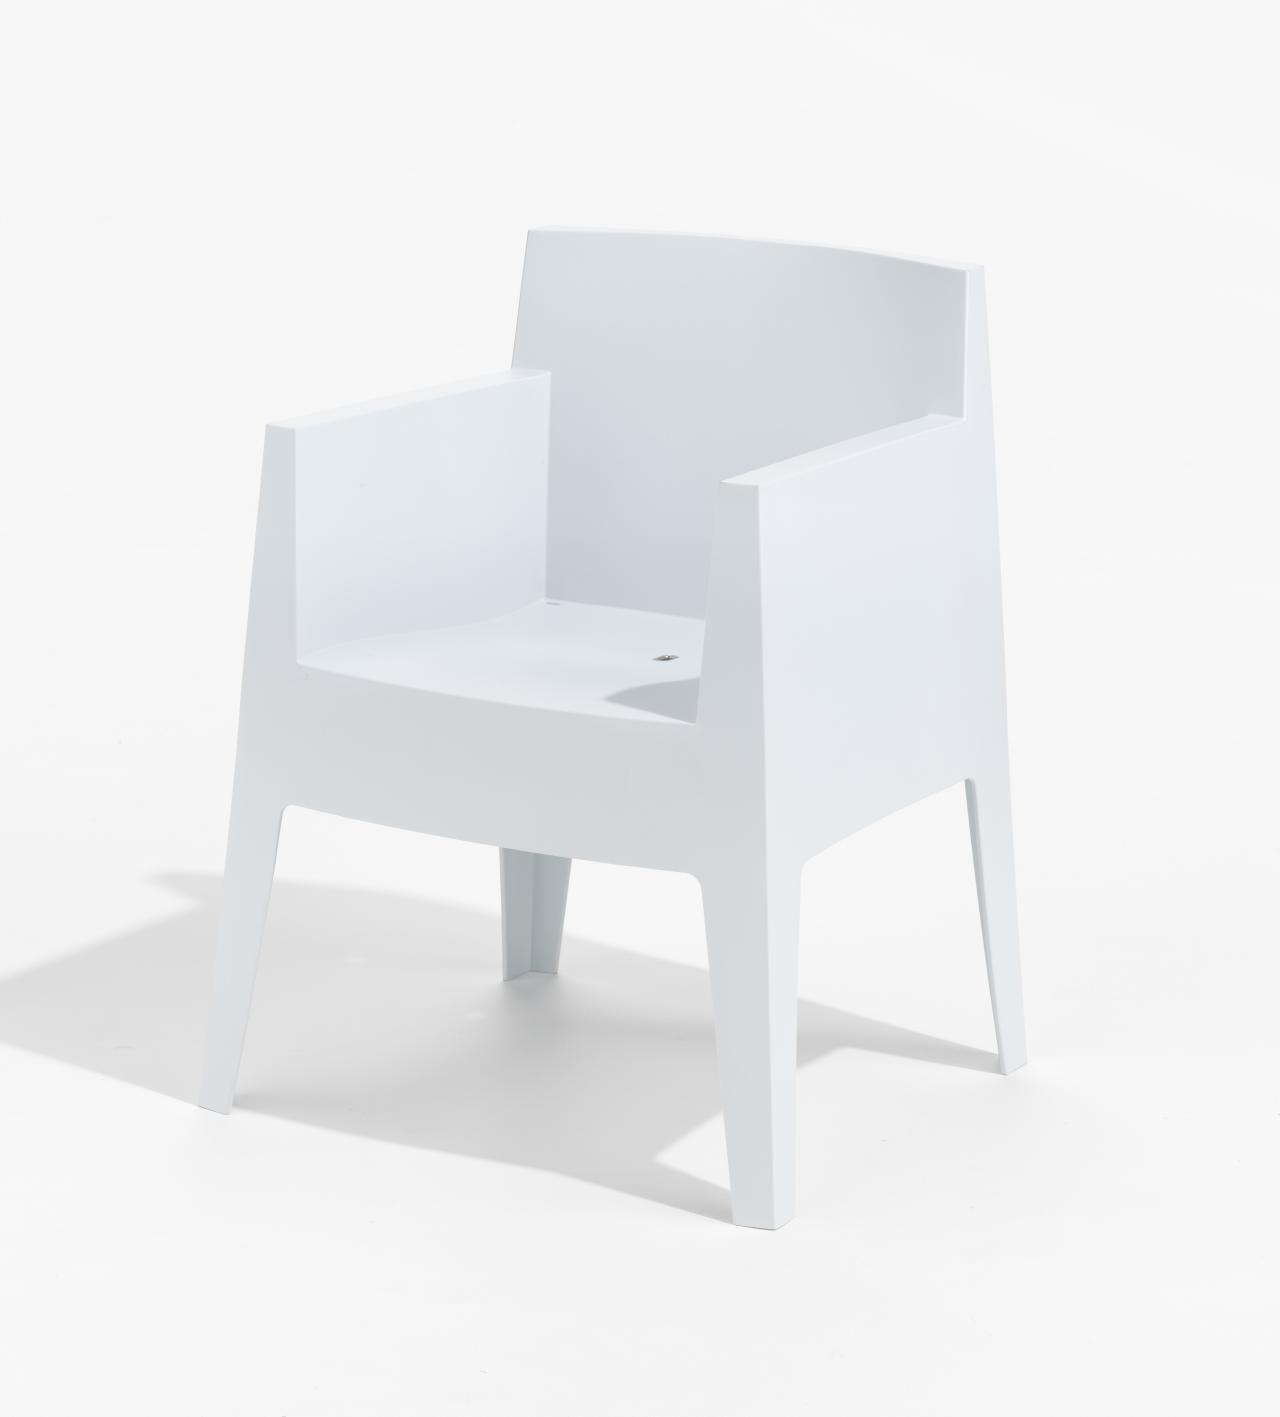 toy armchair grey philippe starck designer driade milan